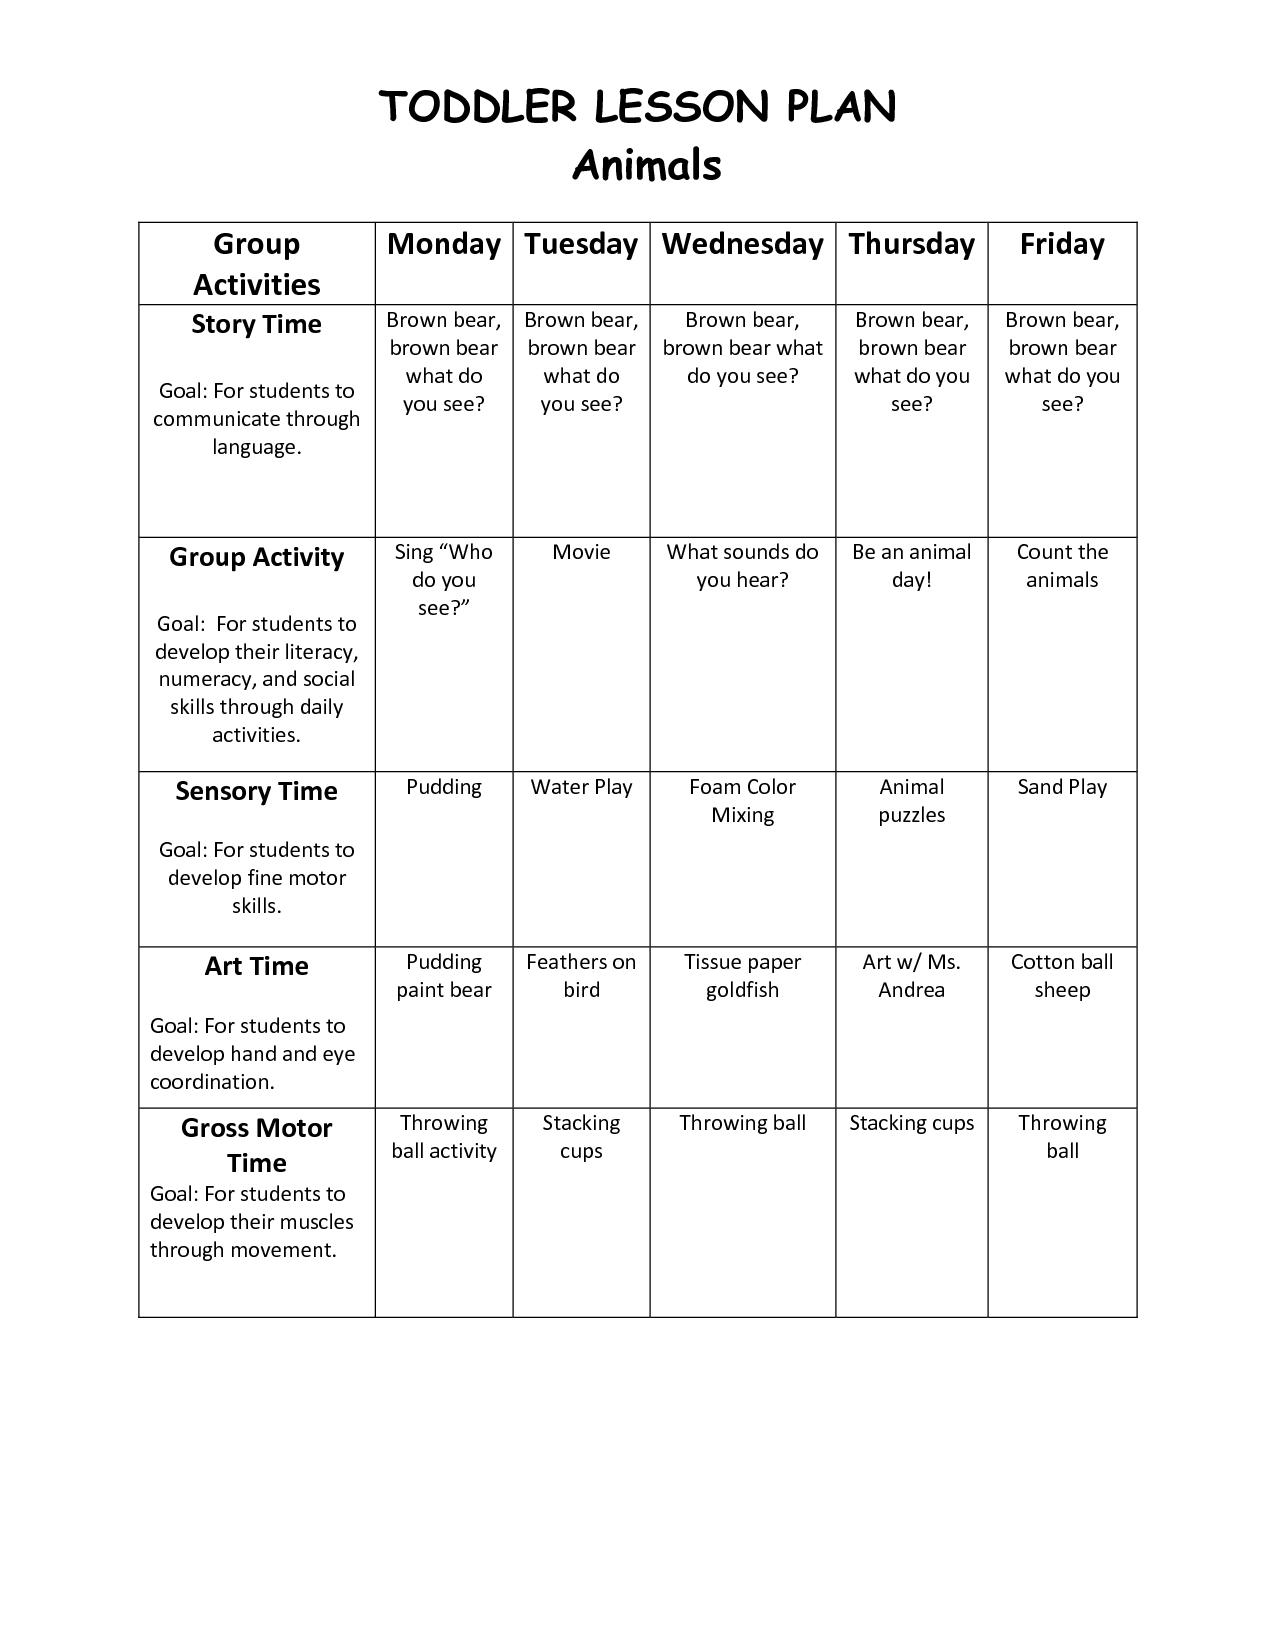 Infant Blank Lesson Plan Sheets | Toddler Lesson Plan 1 | School - Free Printable Preschool Lesson Plans